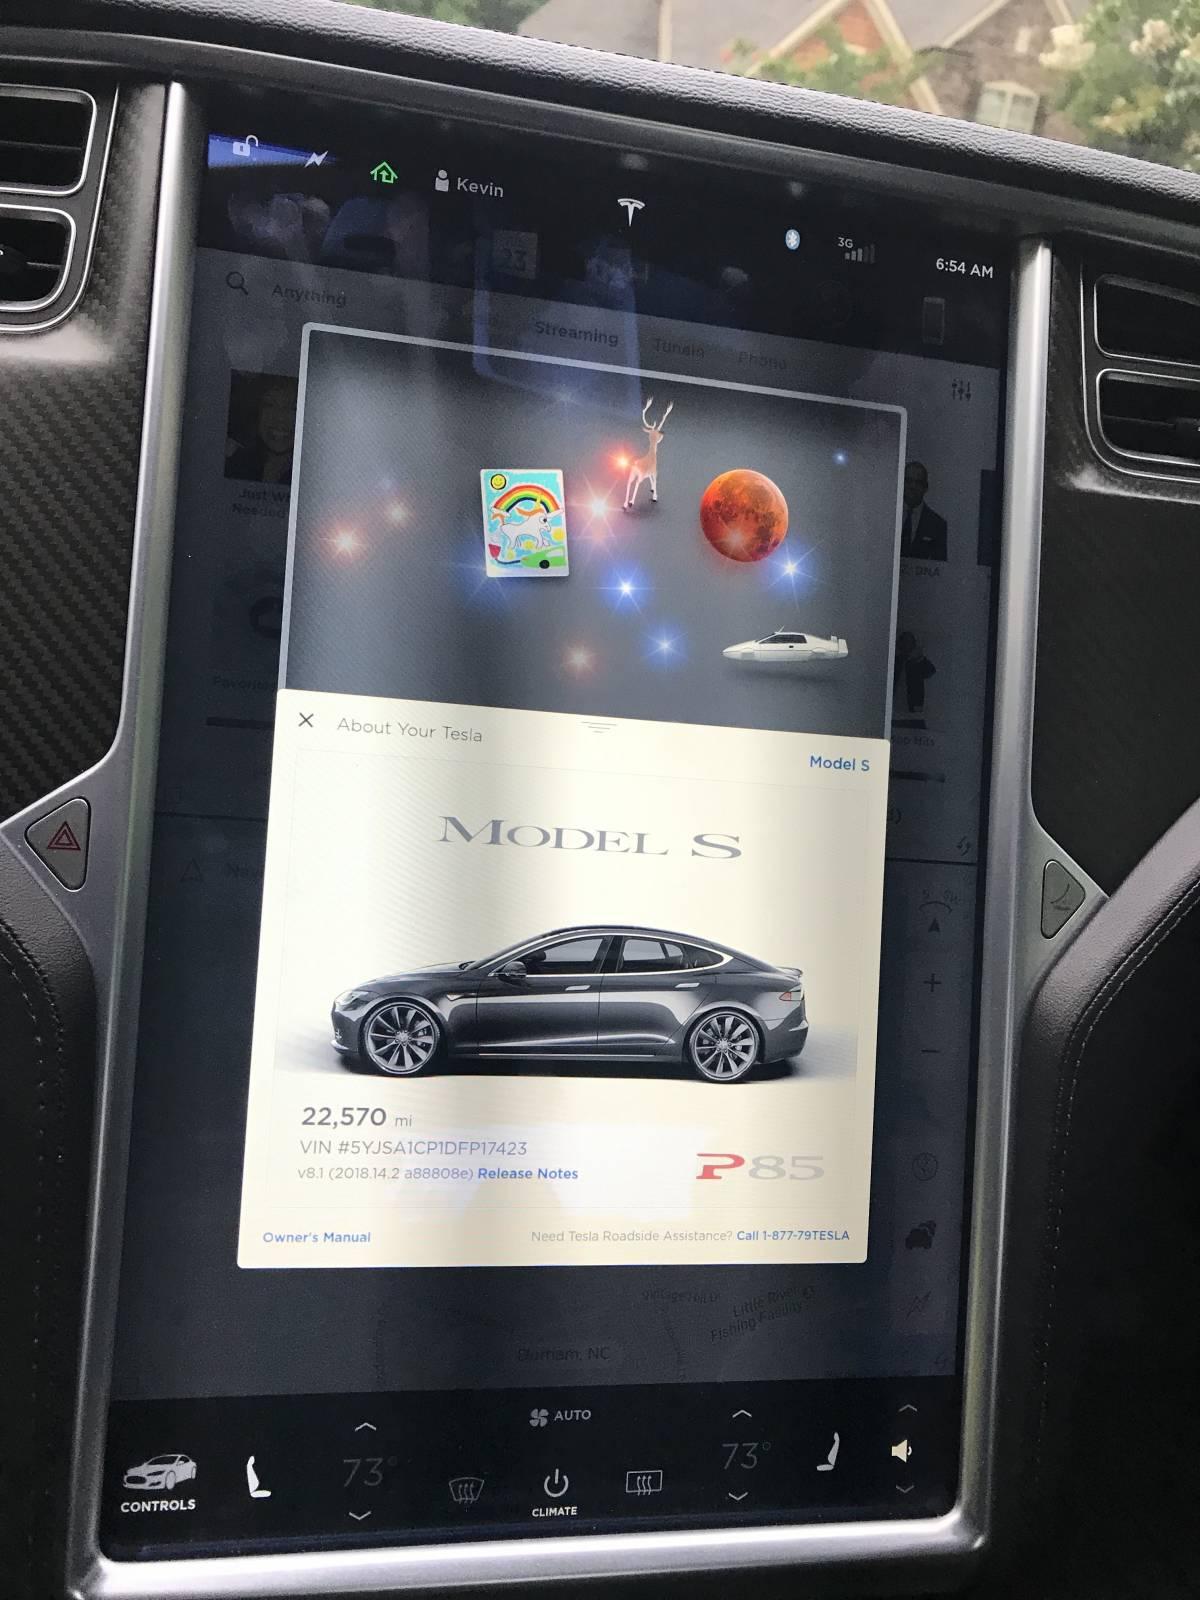 2013 Tesla Model S 5YJSA1CP1DFP17423